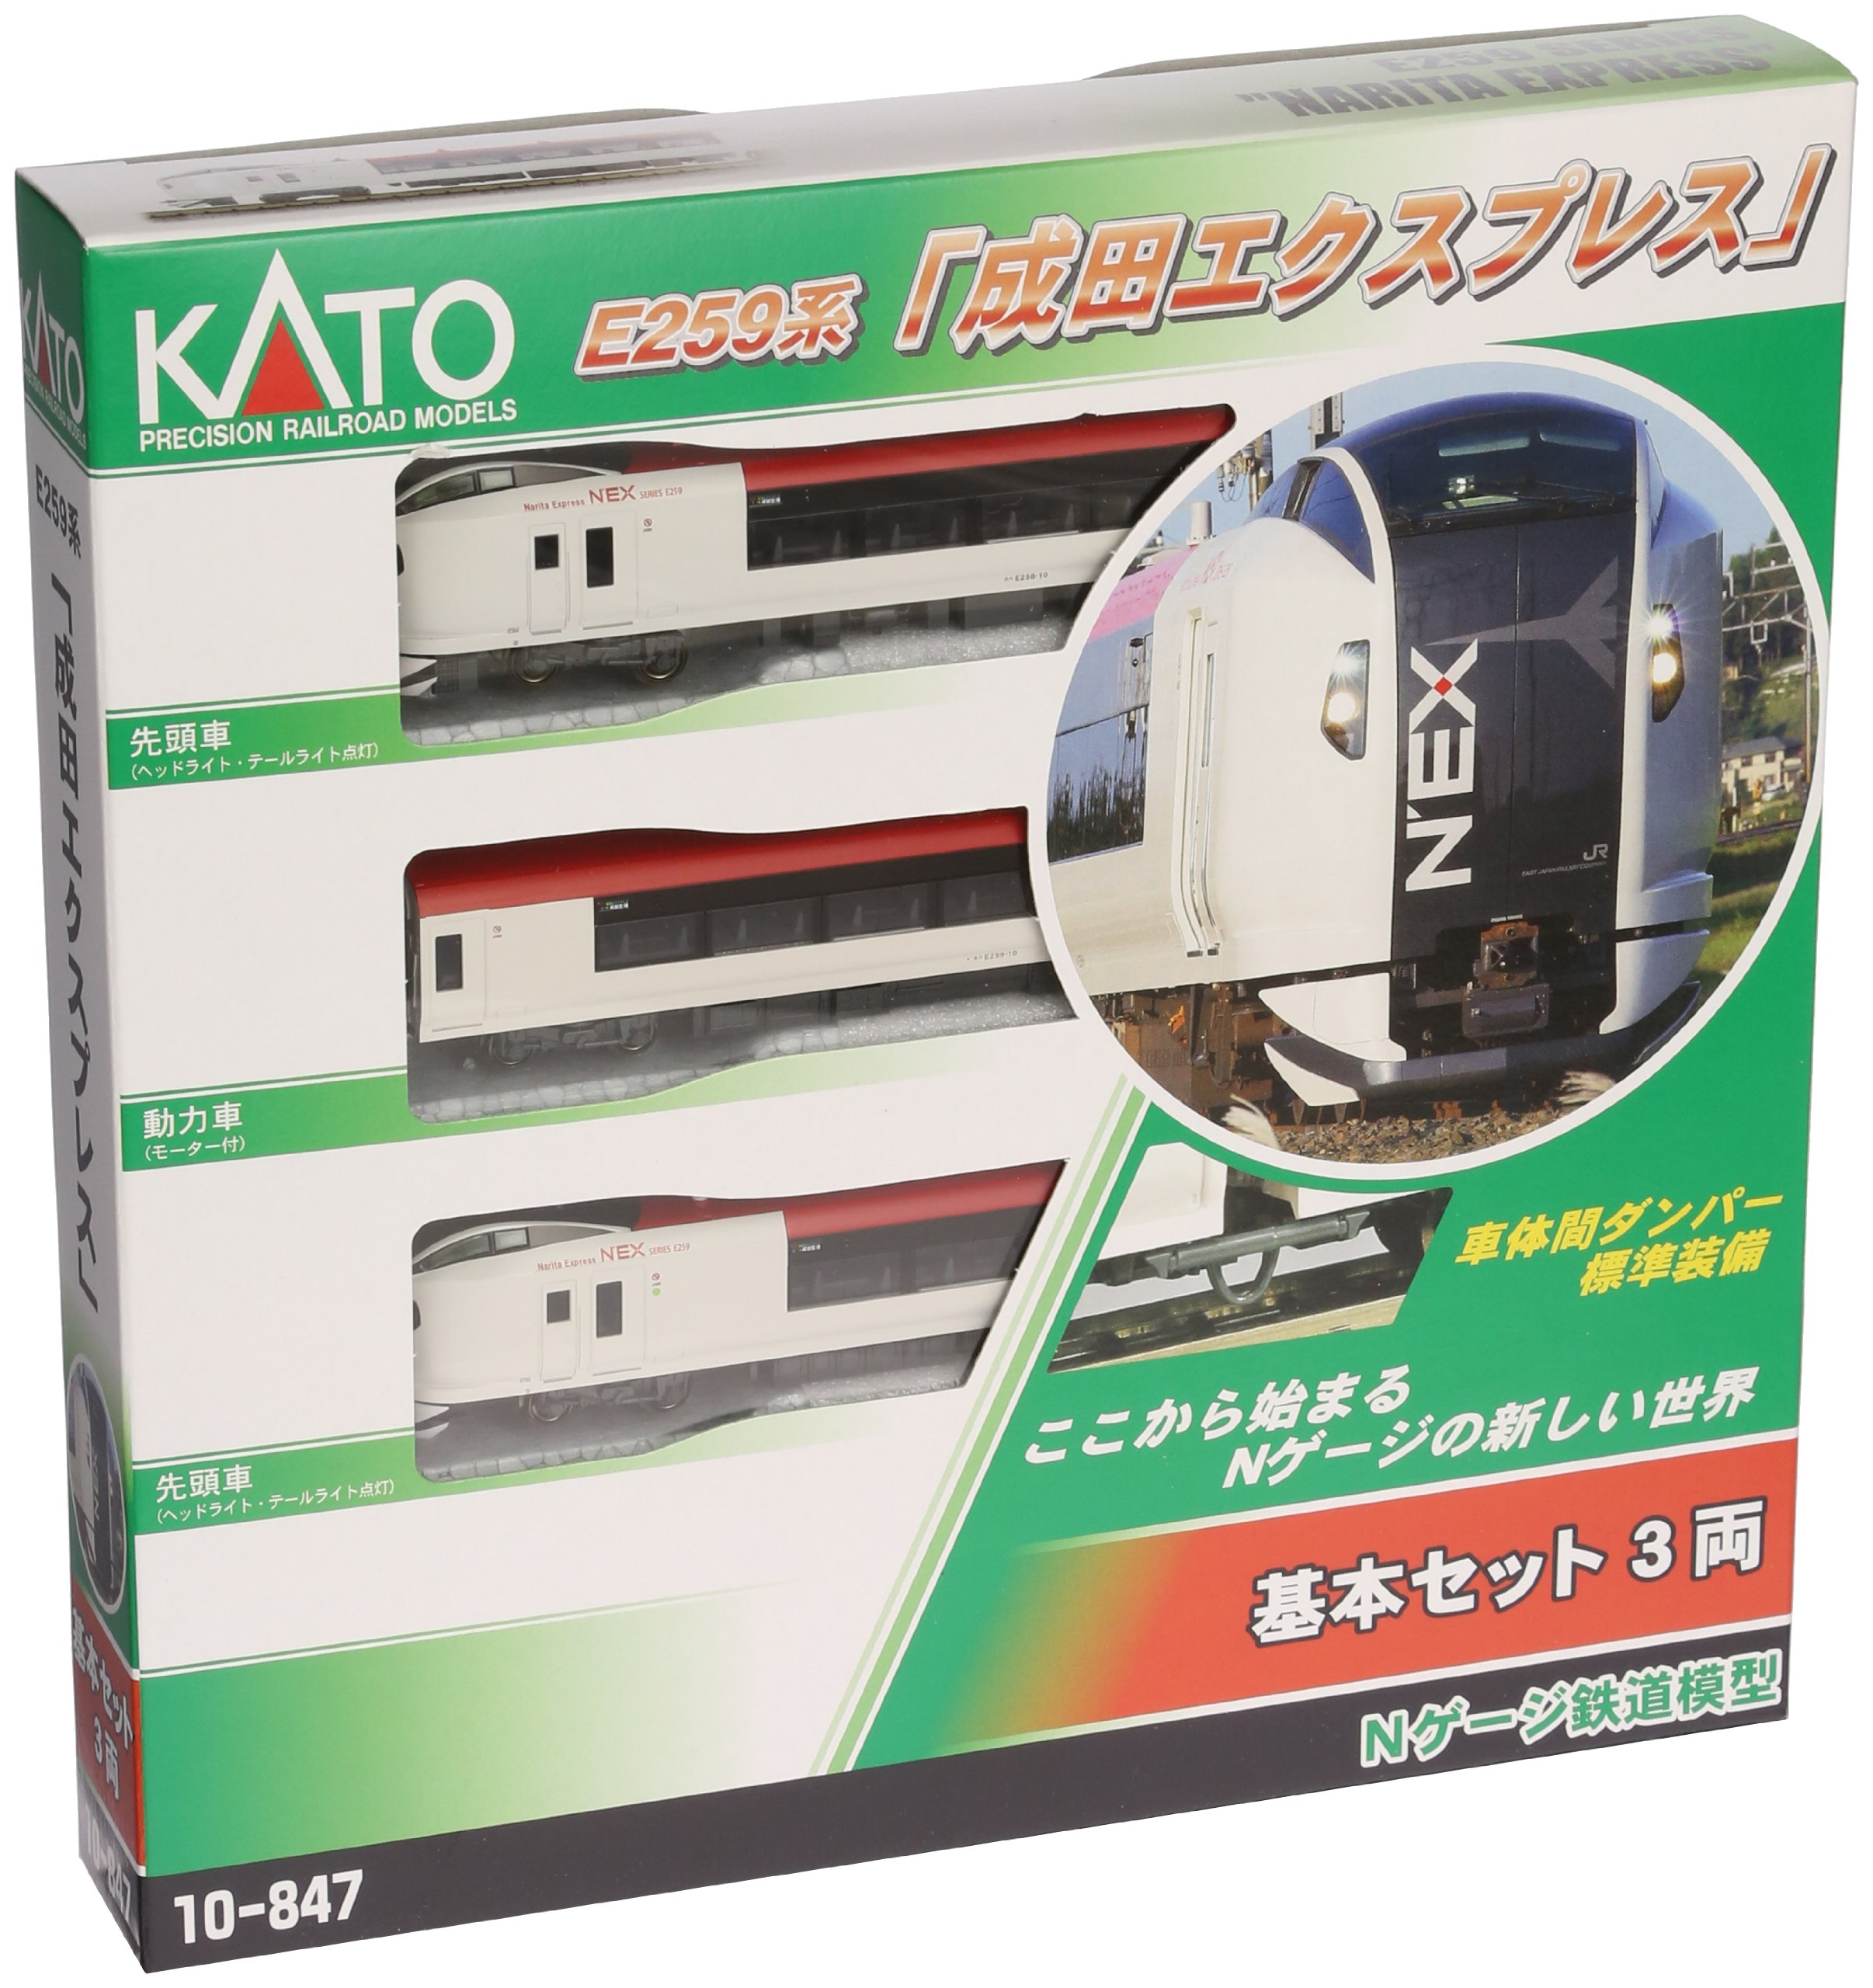 Kato N Gauge Series E259 `Narita Express` (Basic 3-Car Set) (Kato PlaRail Model Train)